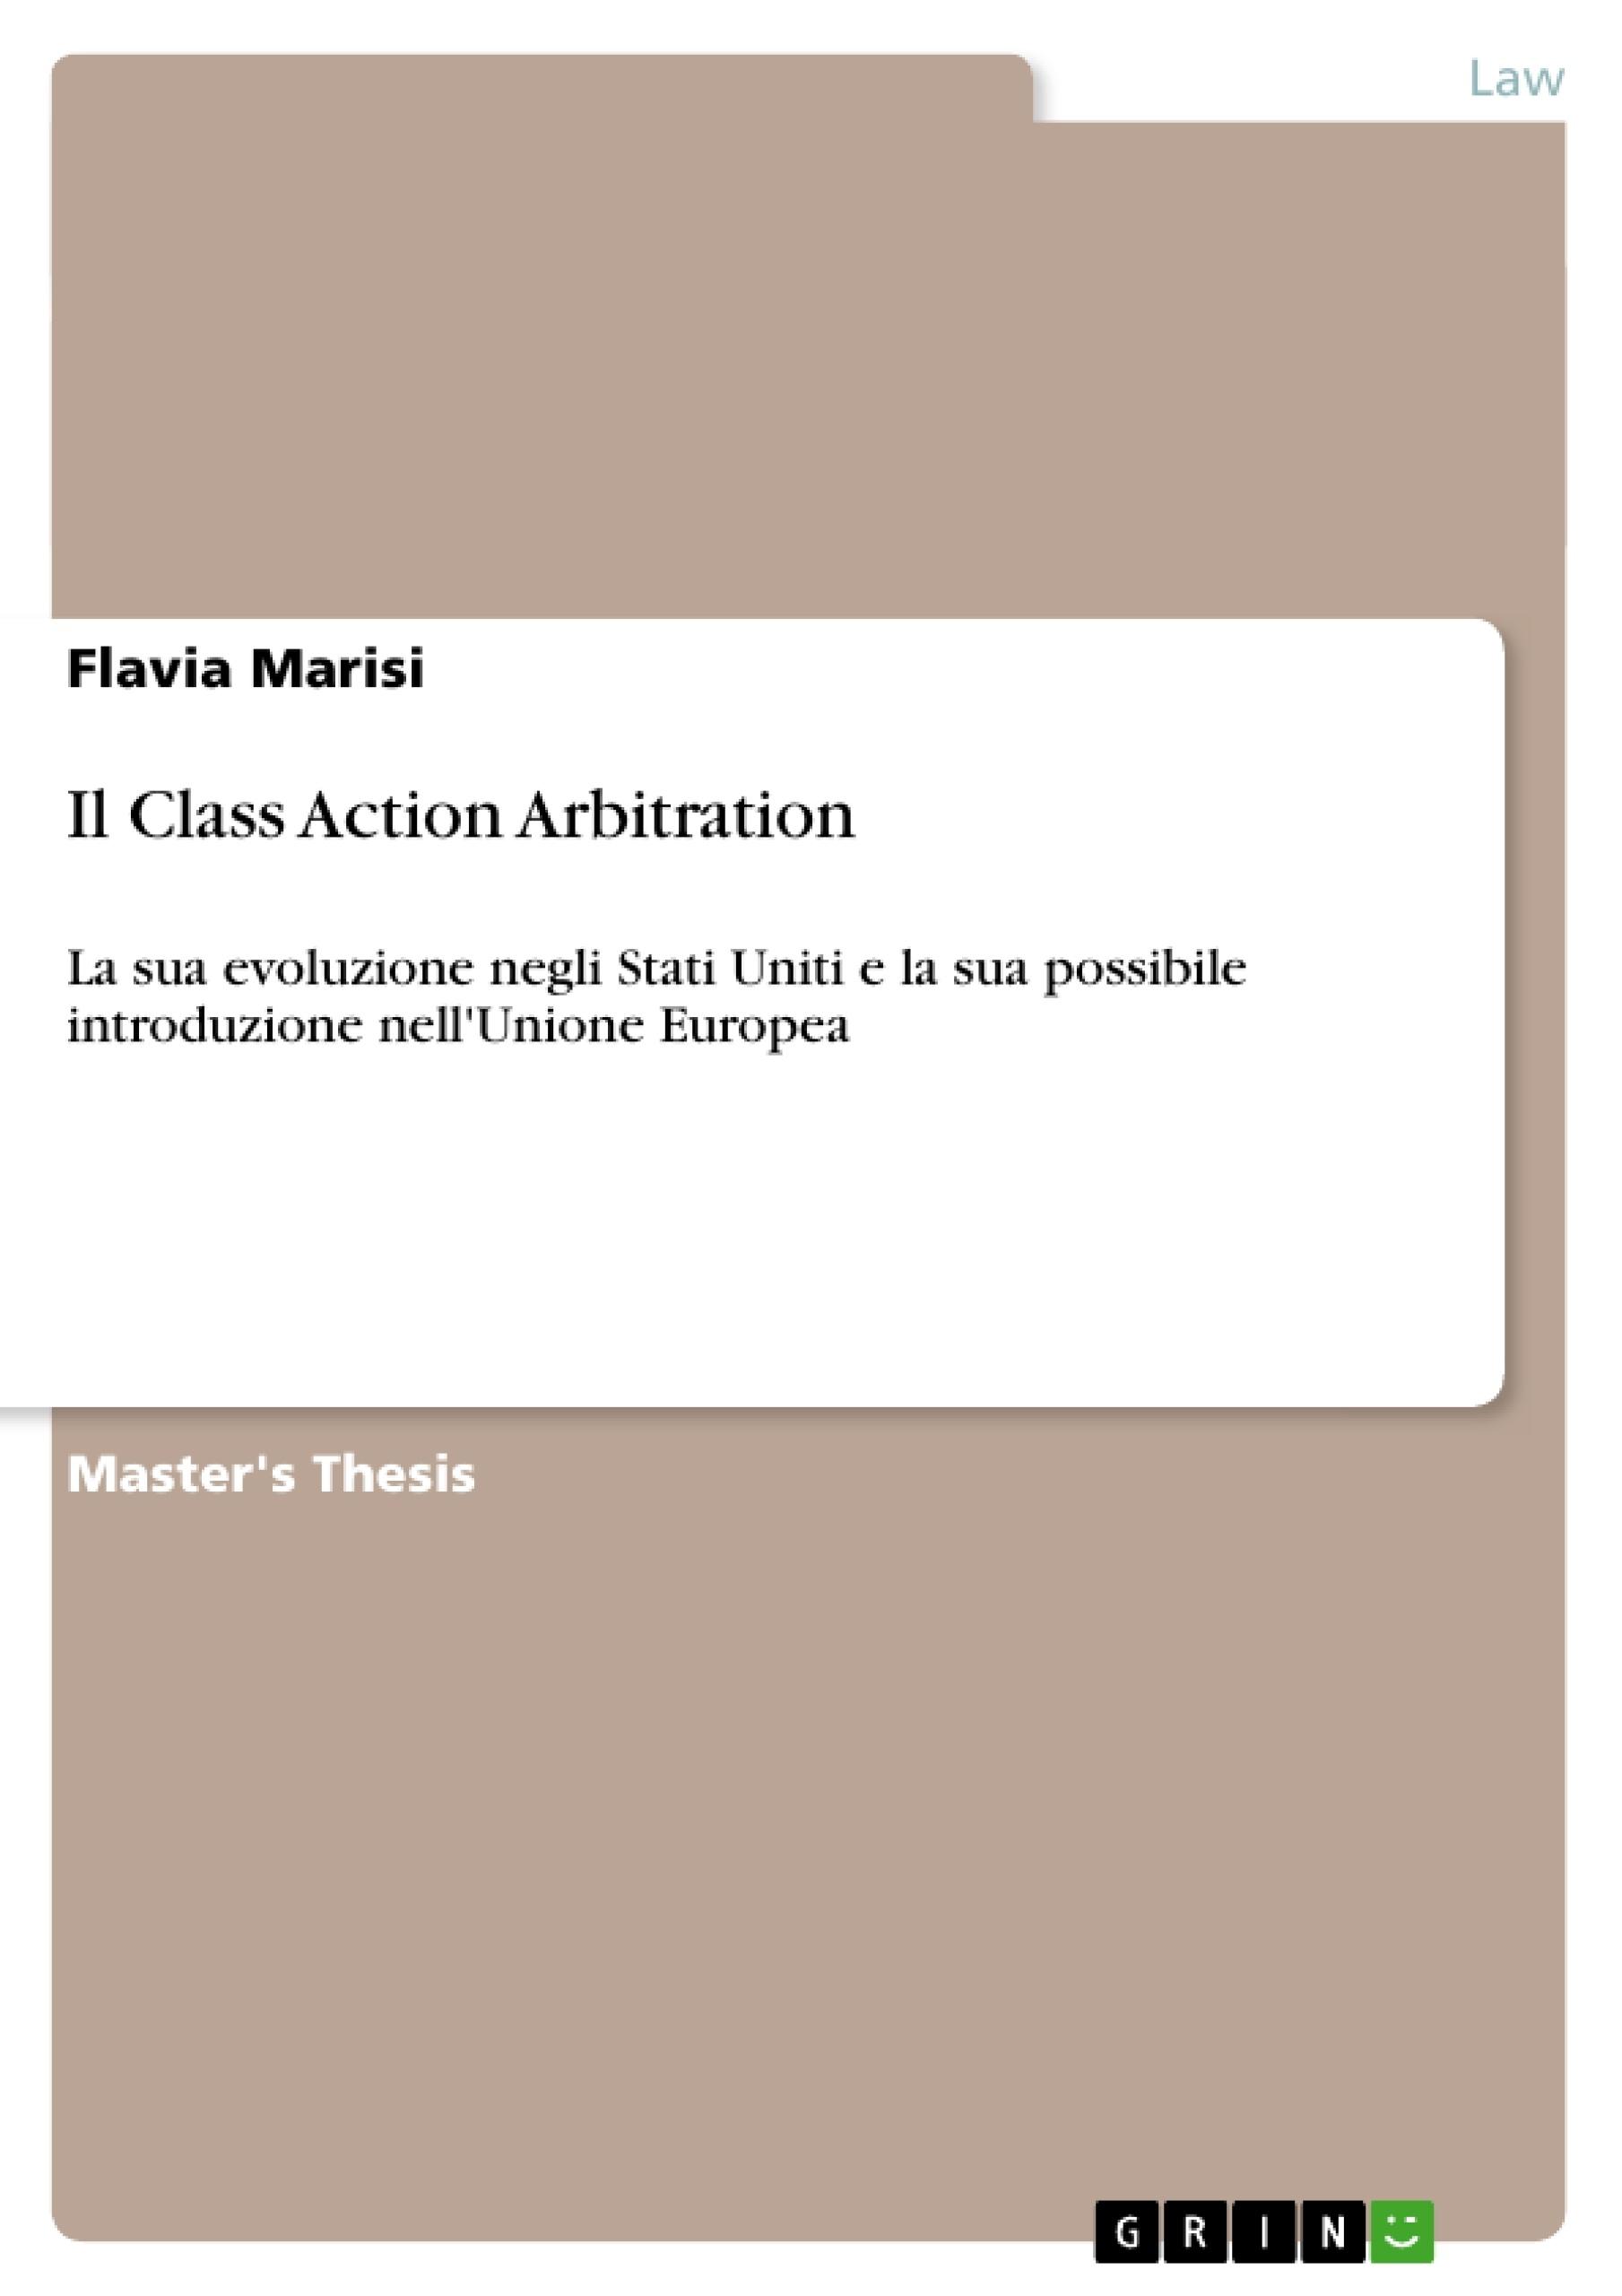 Title: Il Class Action Arbitration